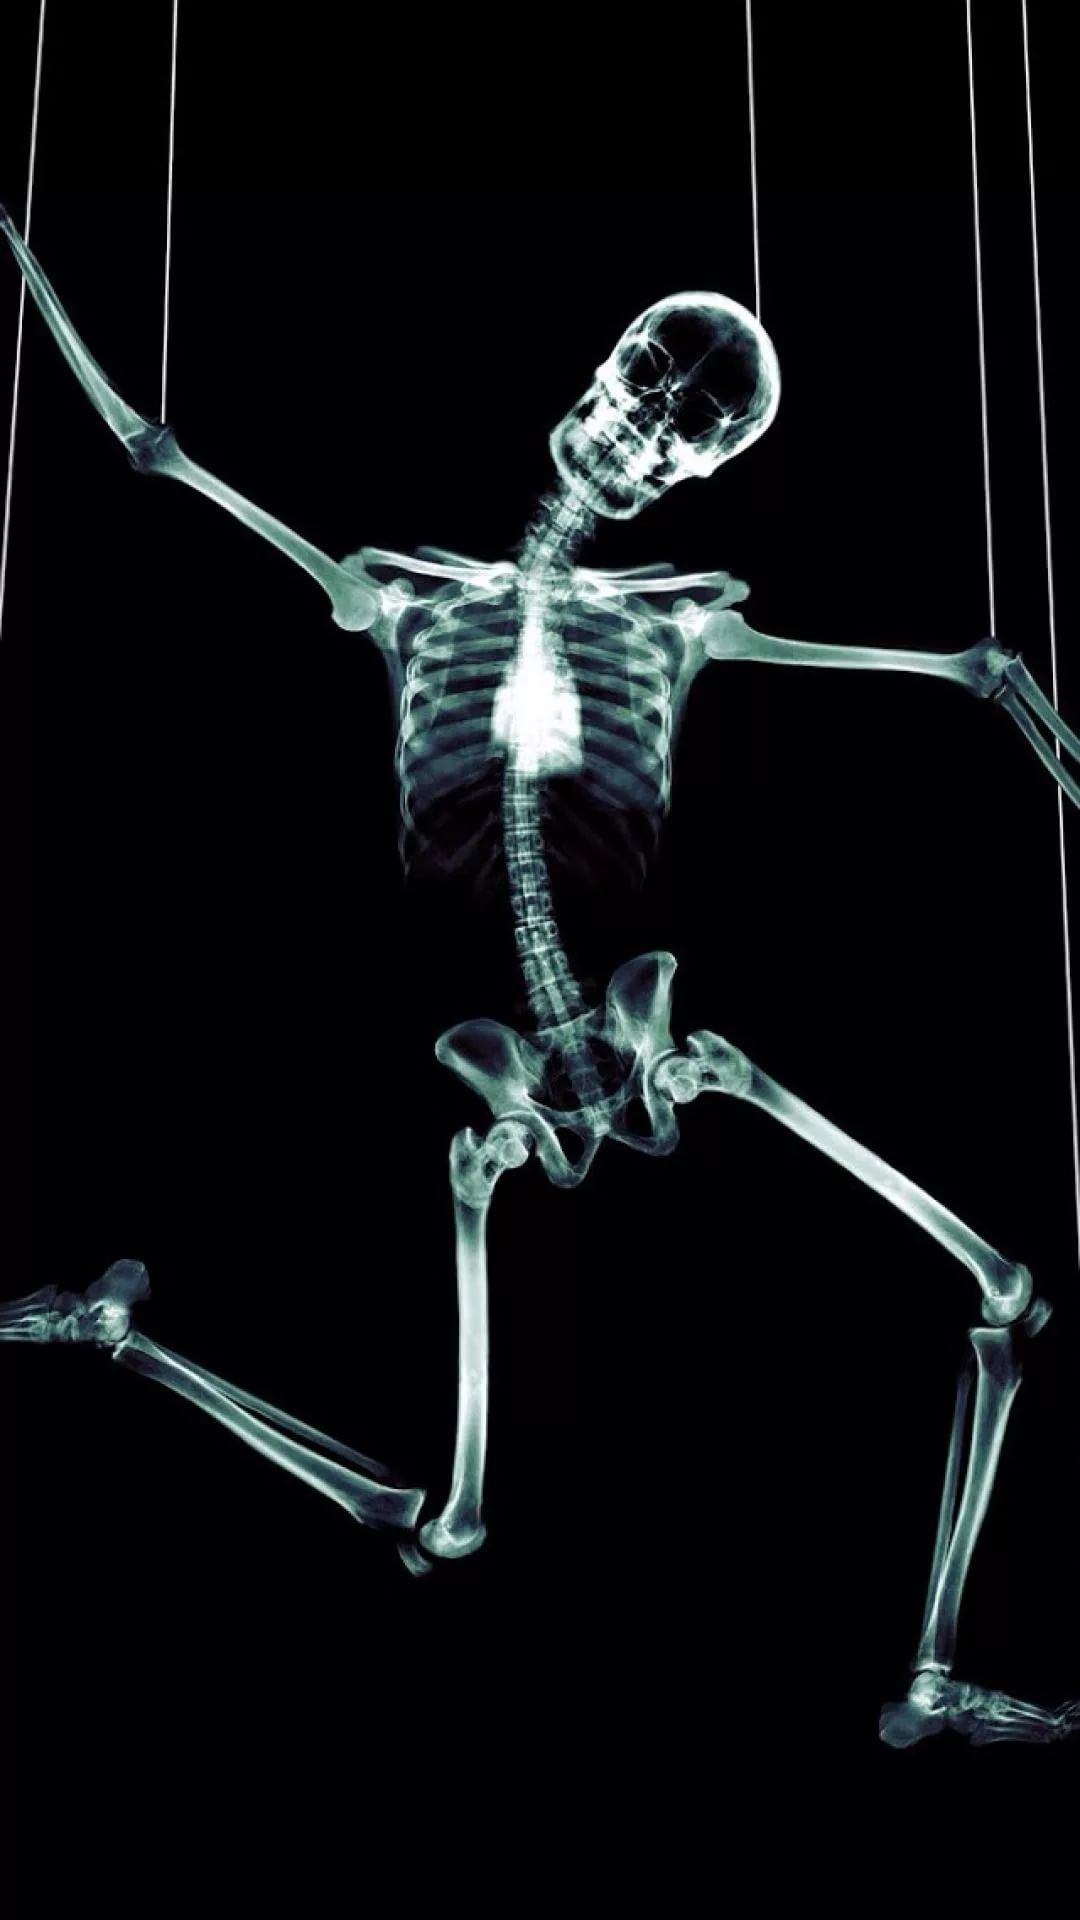 Skeleton Galaxy s9 wallpaper